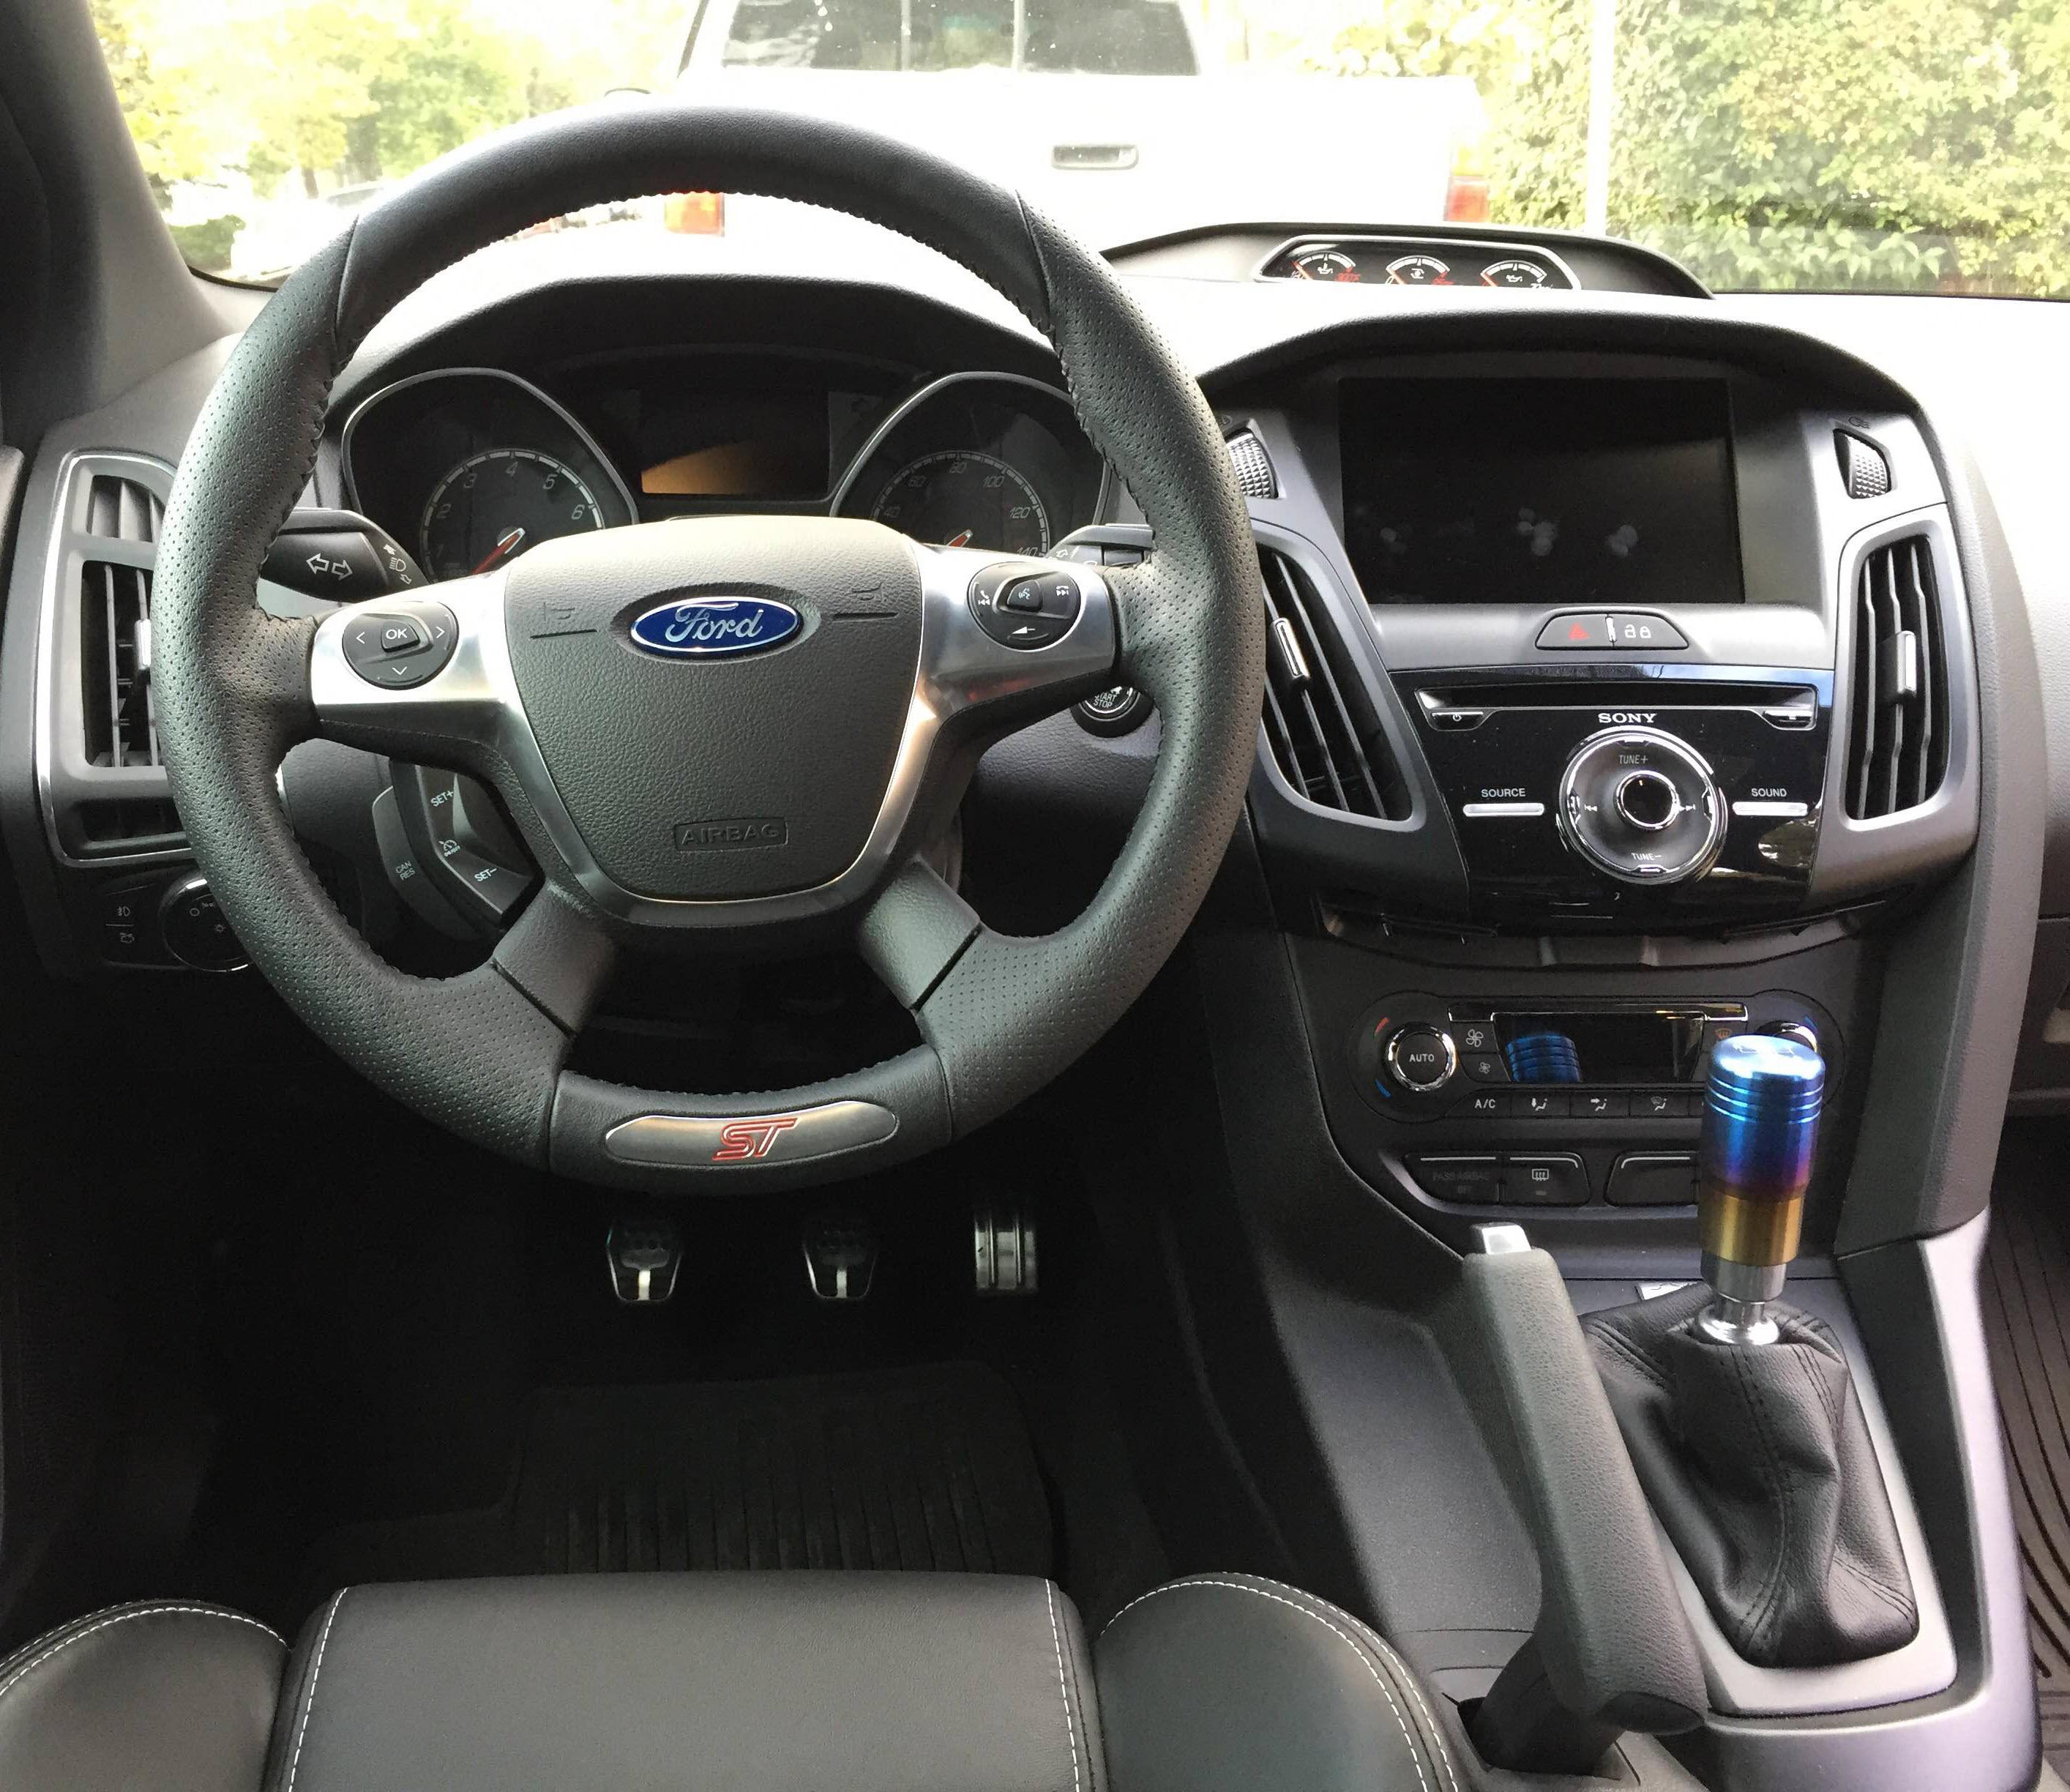 Aftermarket Shift Knobs Ford Focus St Forum